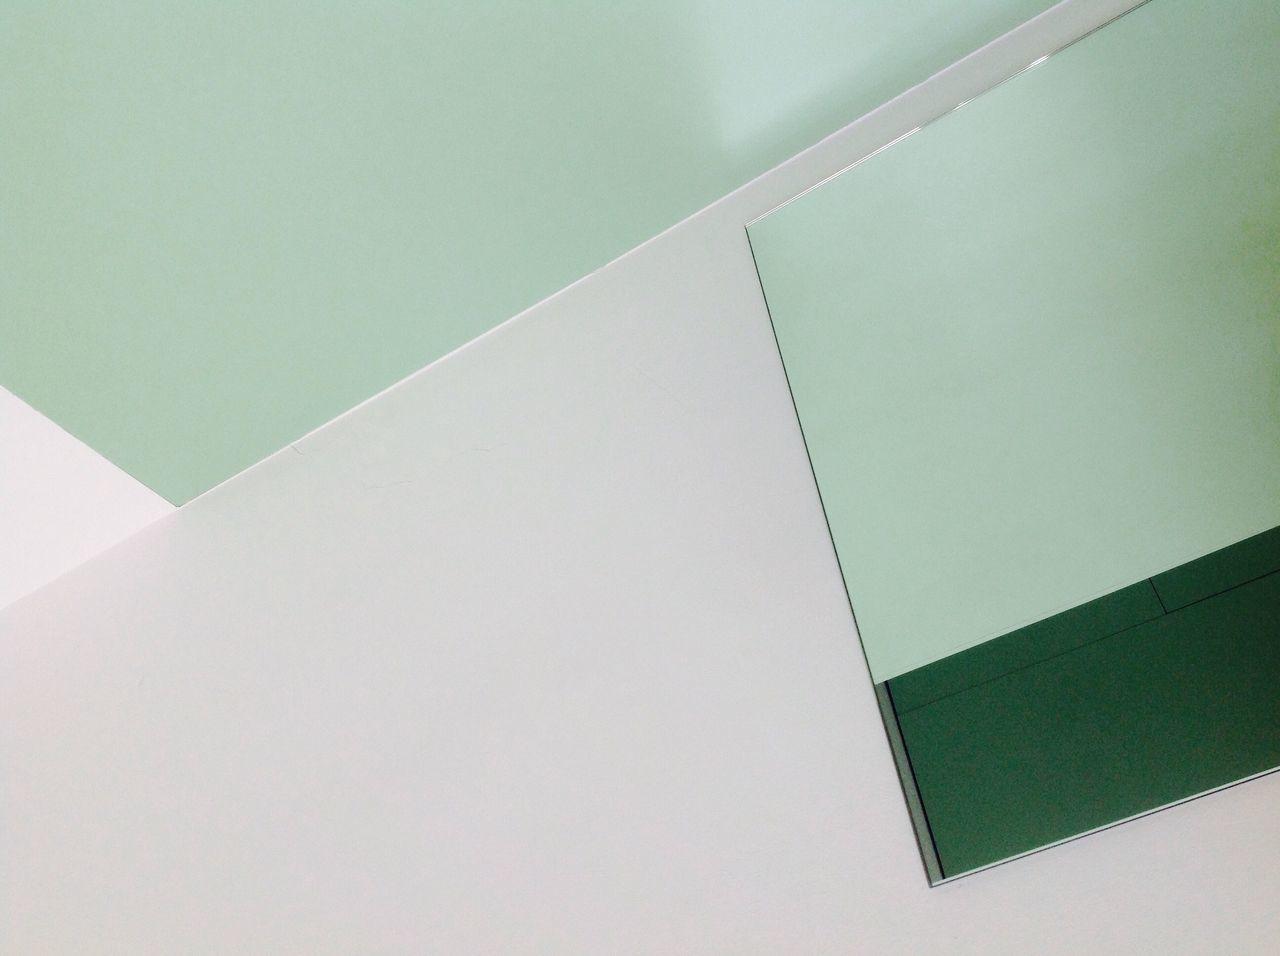 Architecture,  Built Structure,  Ceiling,  Copy Space,  Green Color